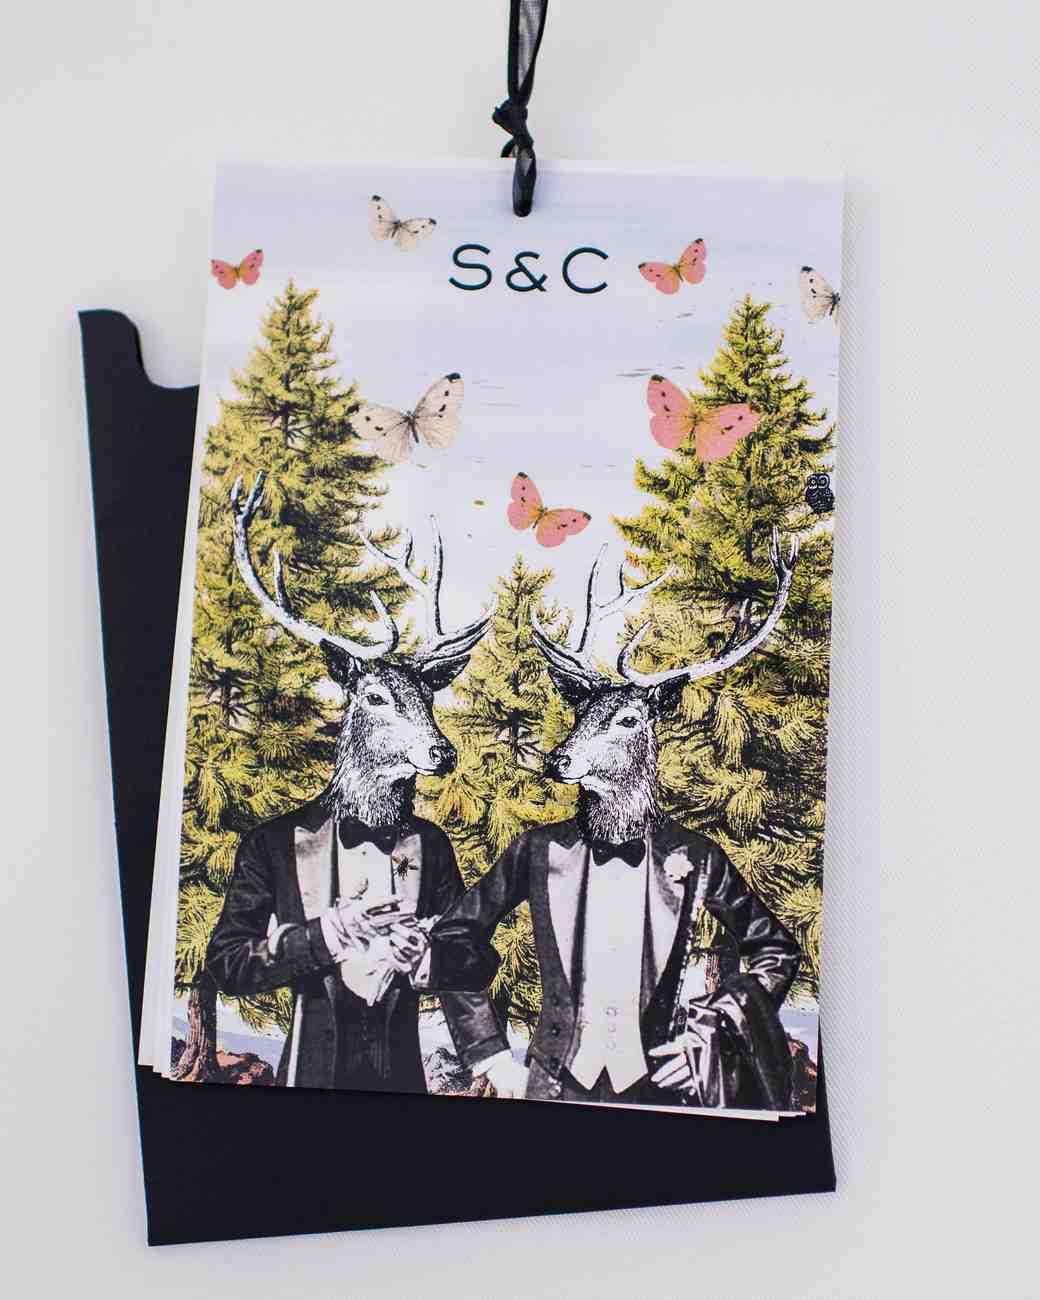 christopher-stephen-wedding-card-0590-s112787-0416.jpg